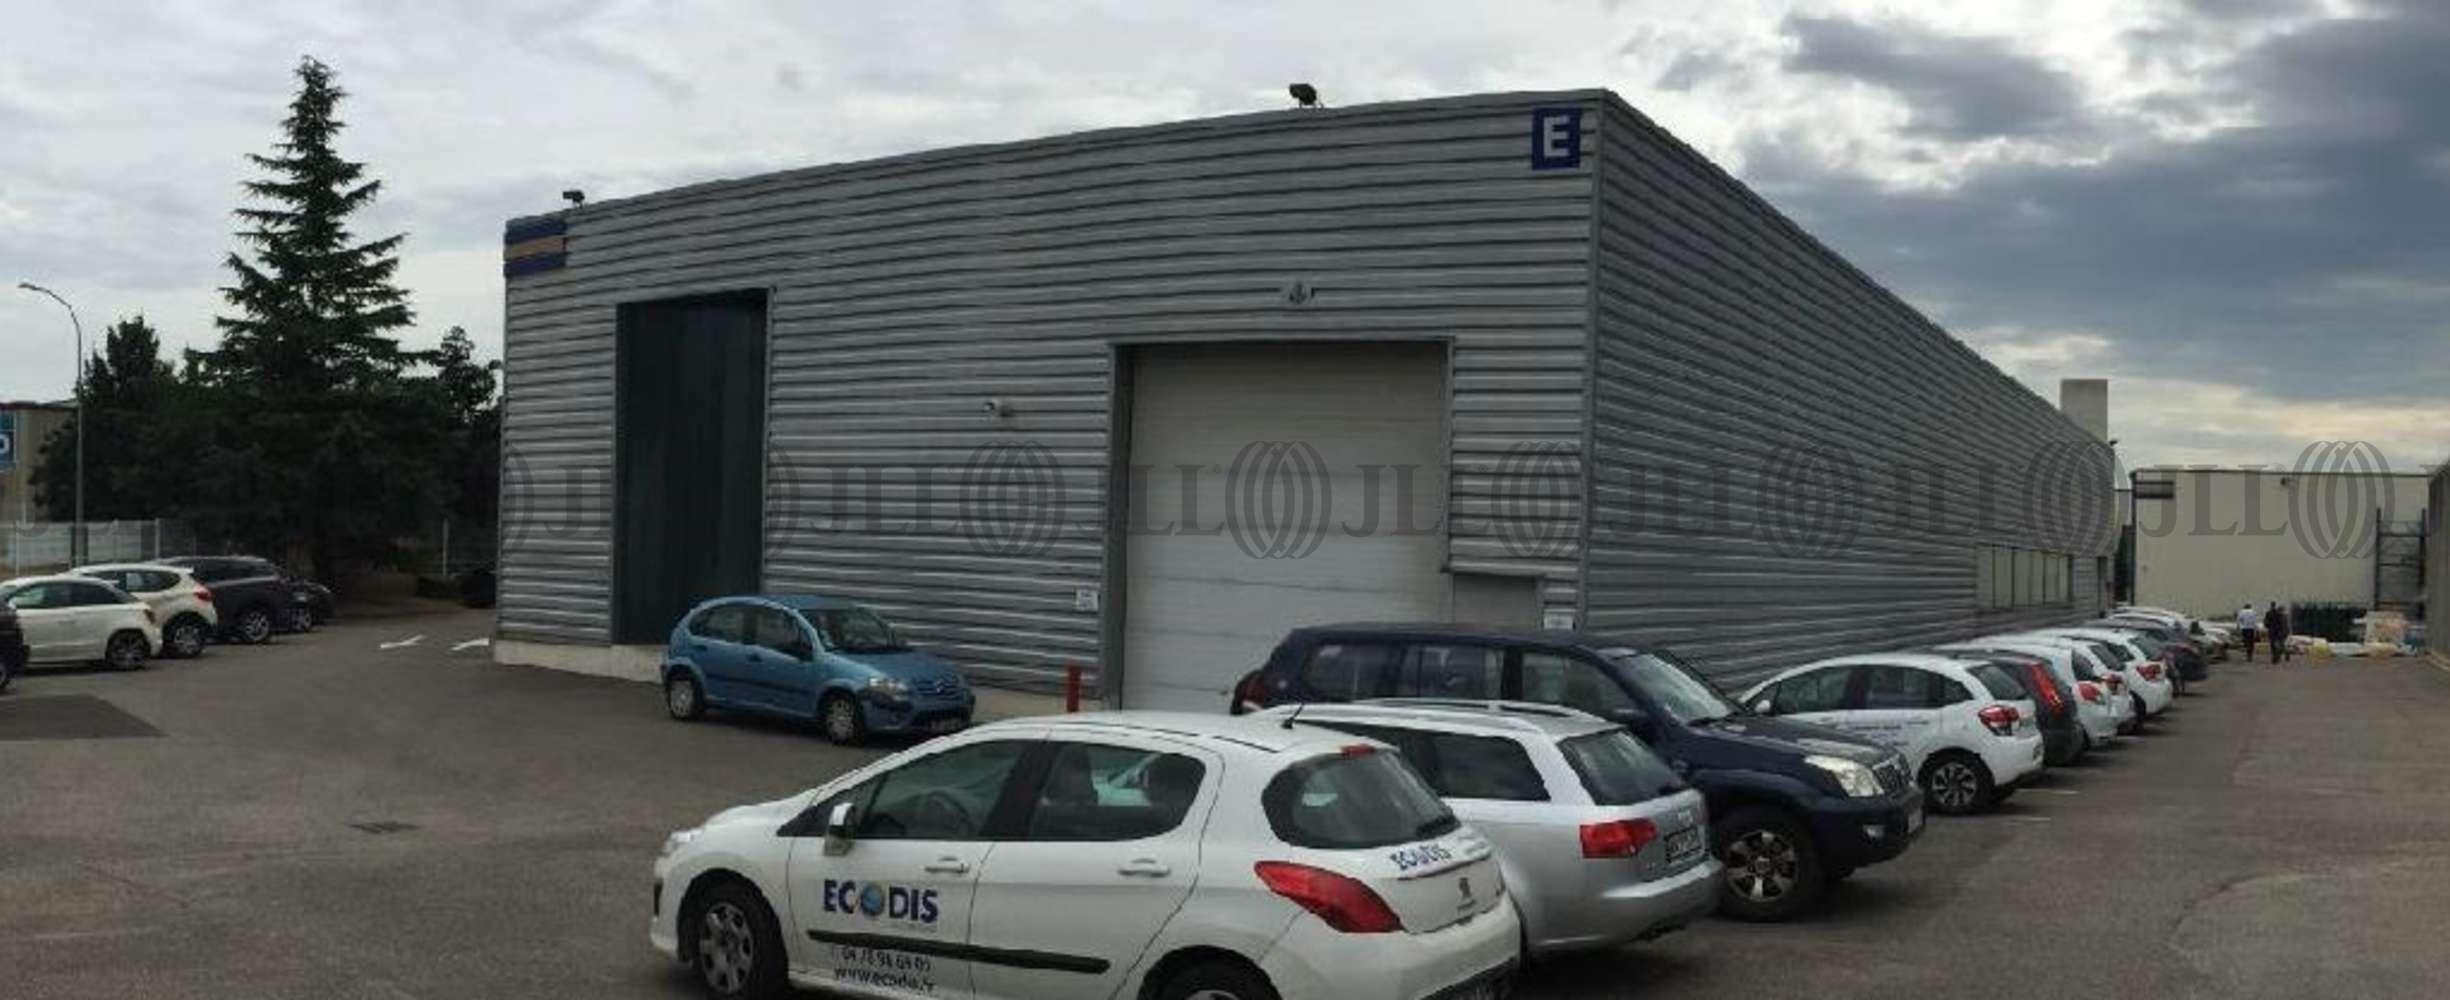 Activités/entrepôt Chaponnay, 69970 - BÂTIMENT MIXTE LYON SUD - CHAPONNAY - 10871000